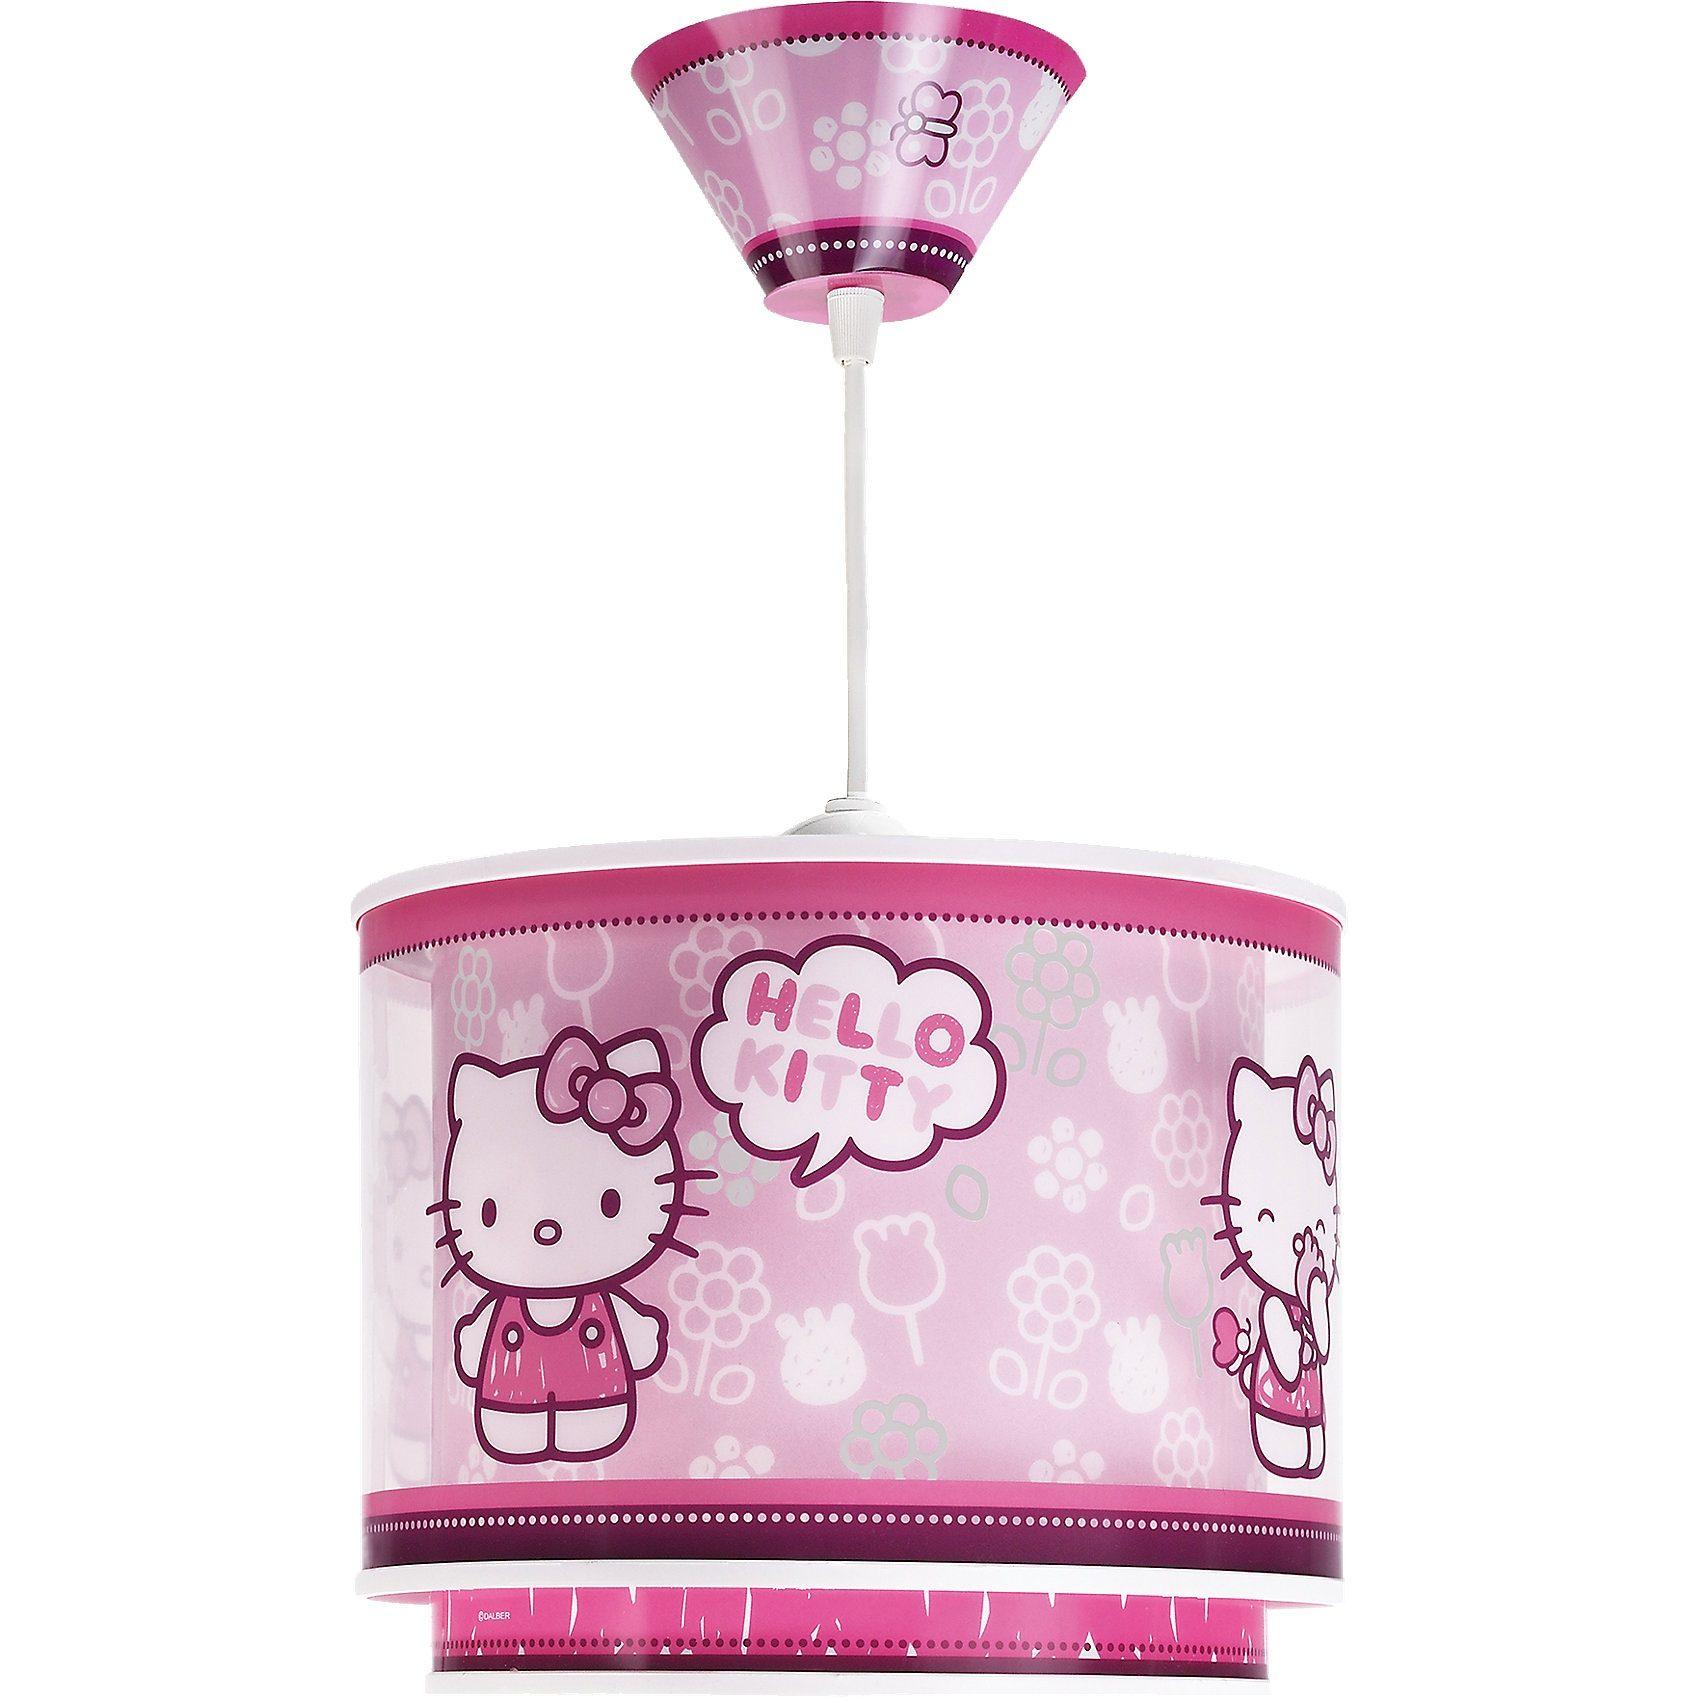 Dalber Hängelampe Hello Kitty, rosa